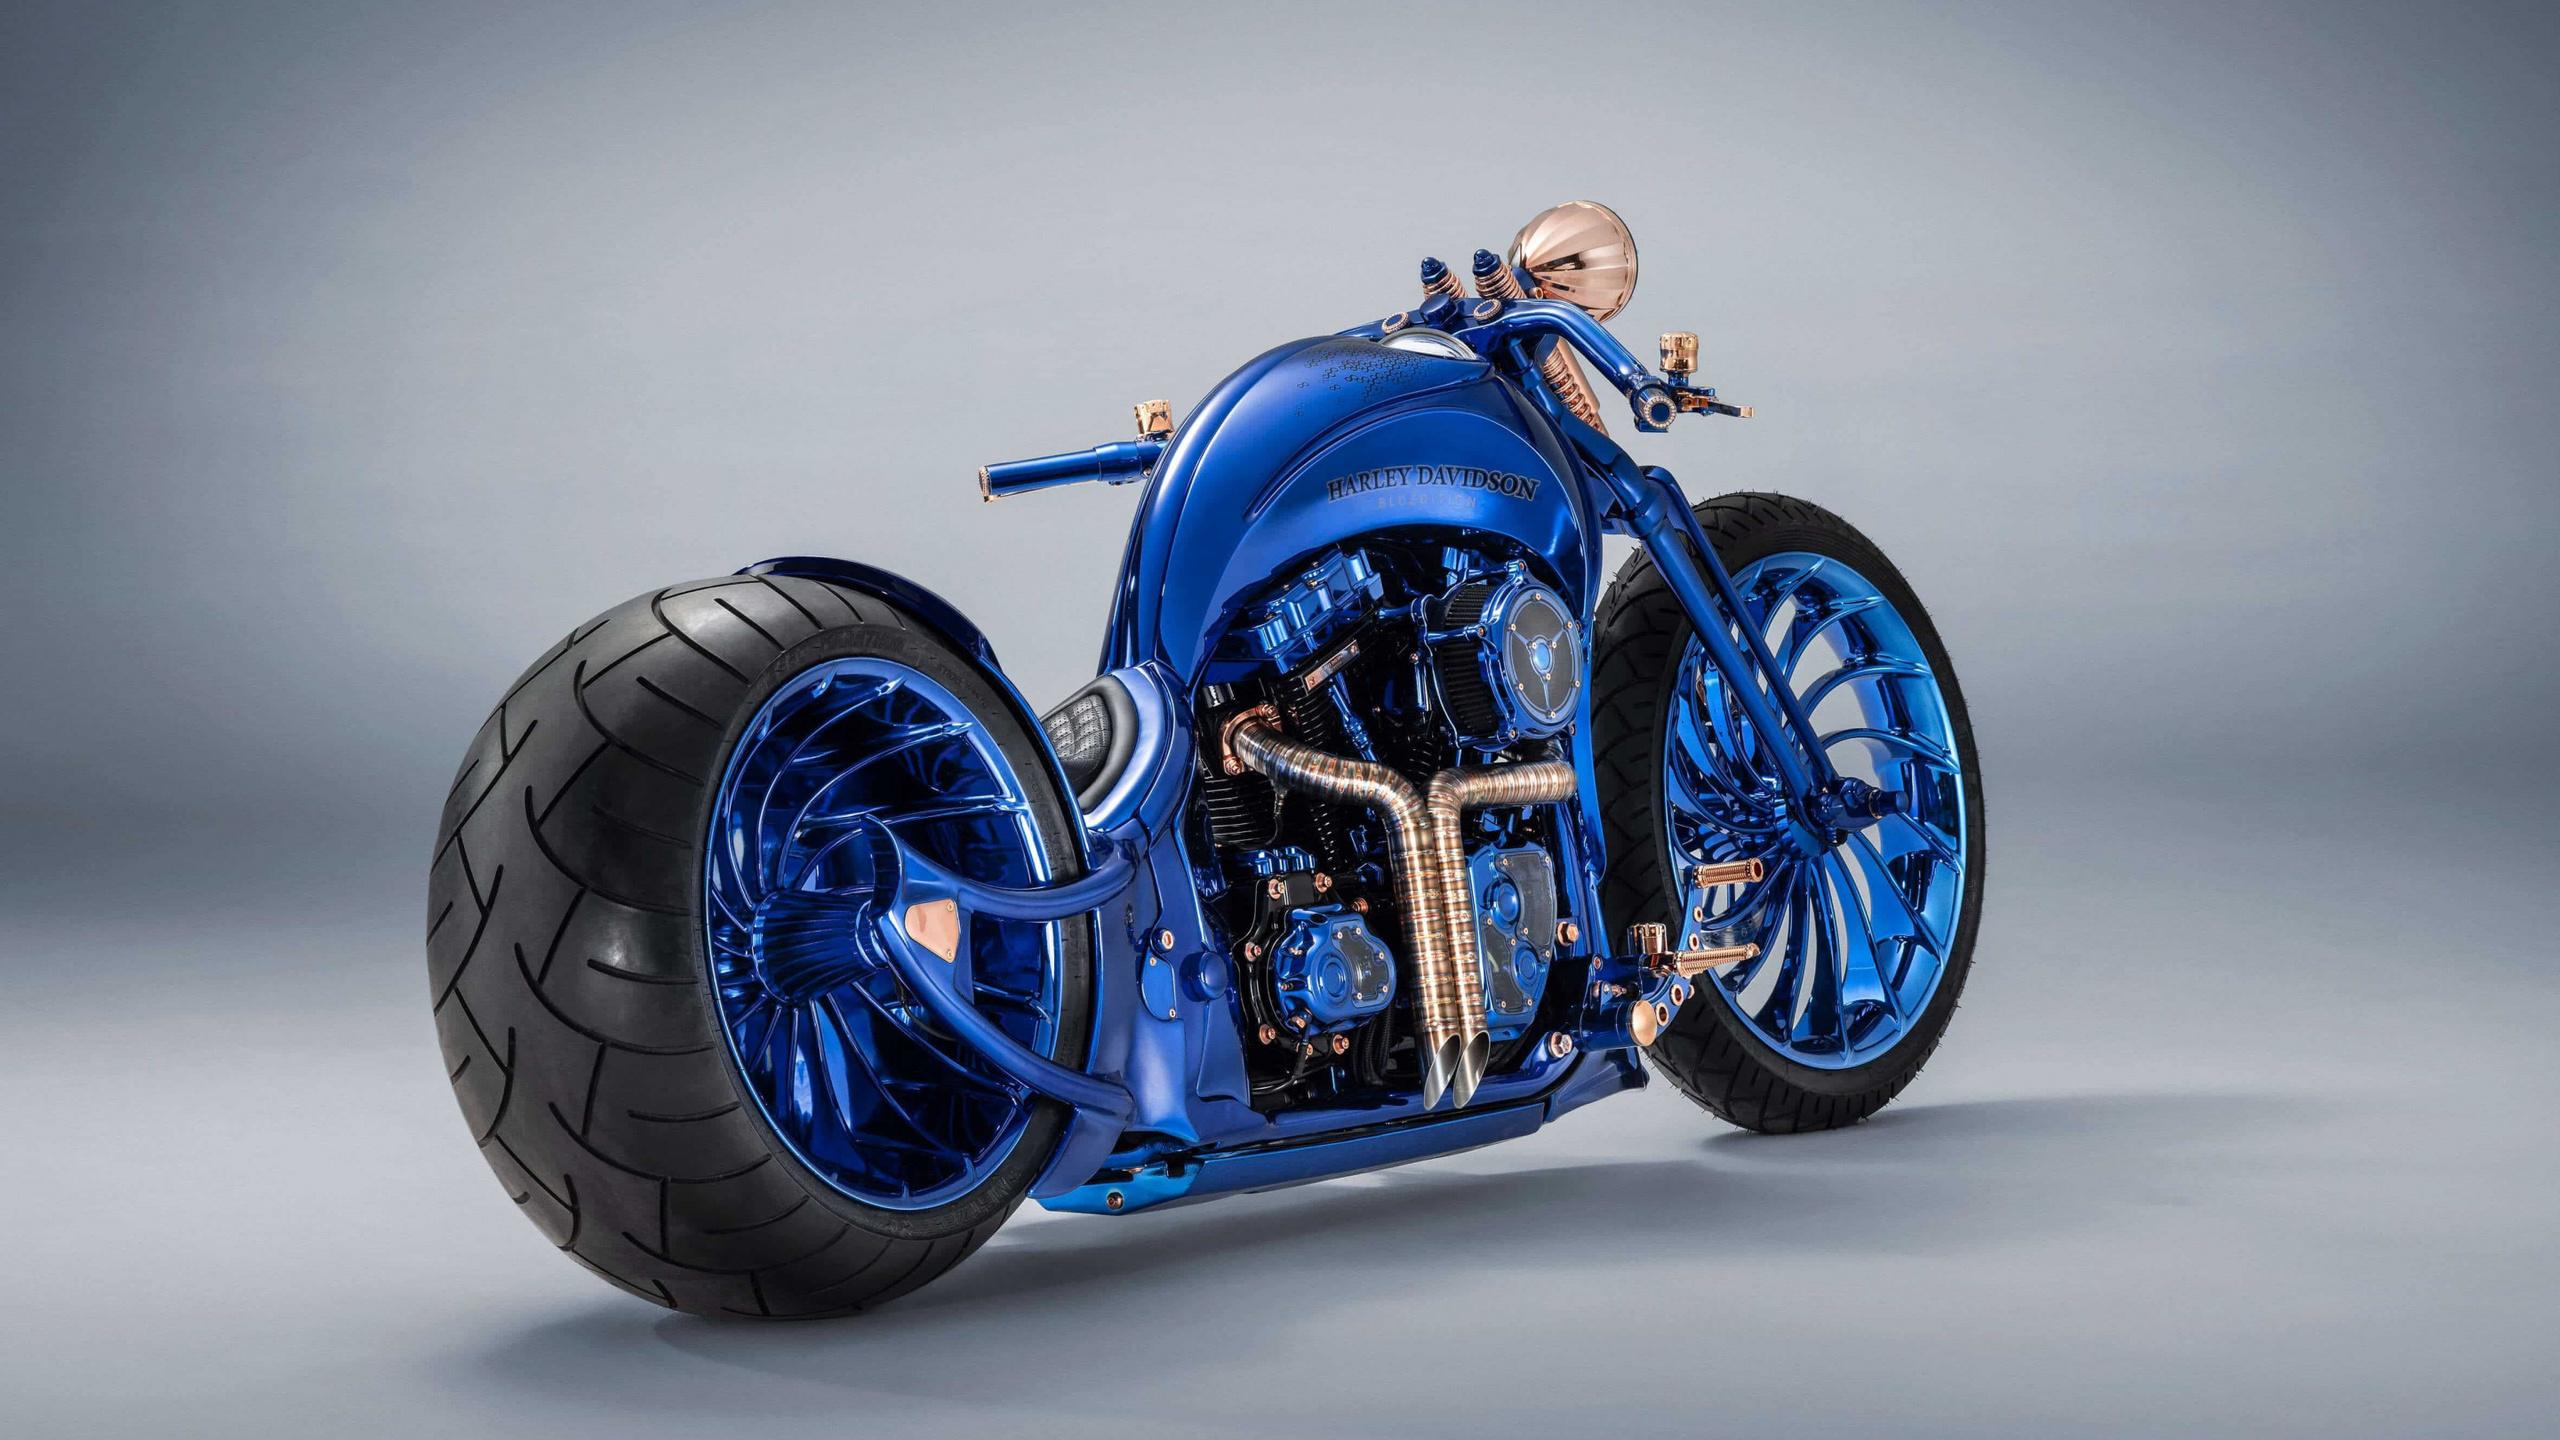 harley davidson, luxury, blue, chopper